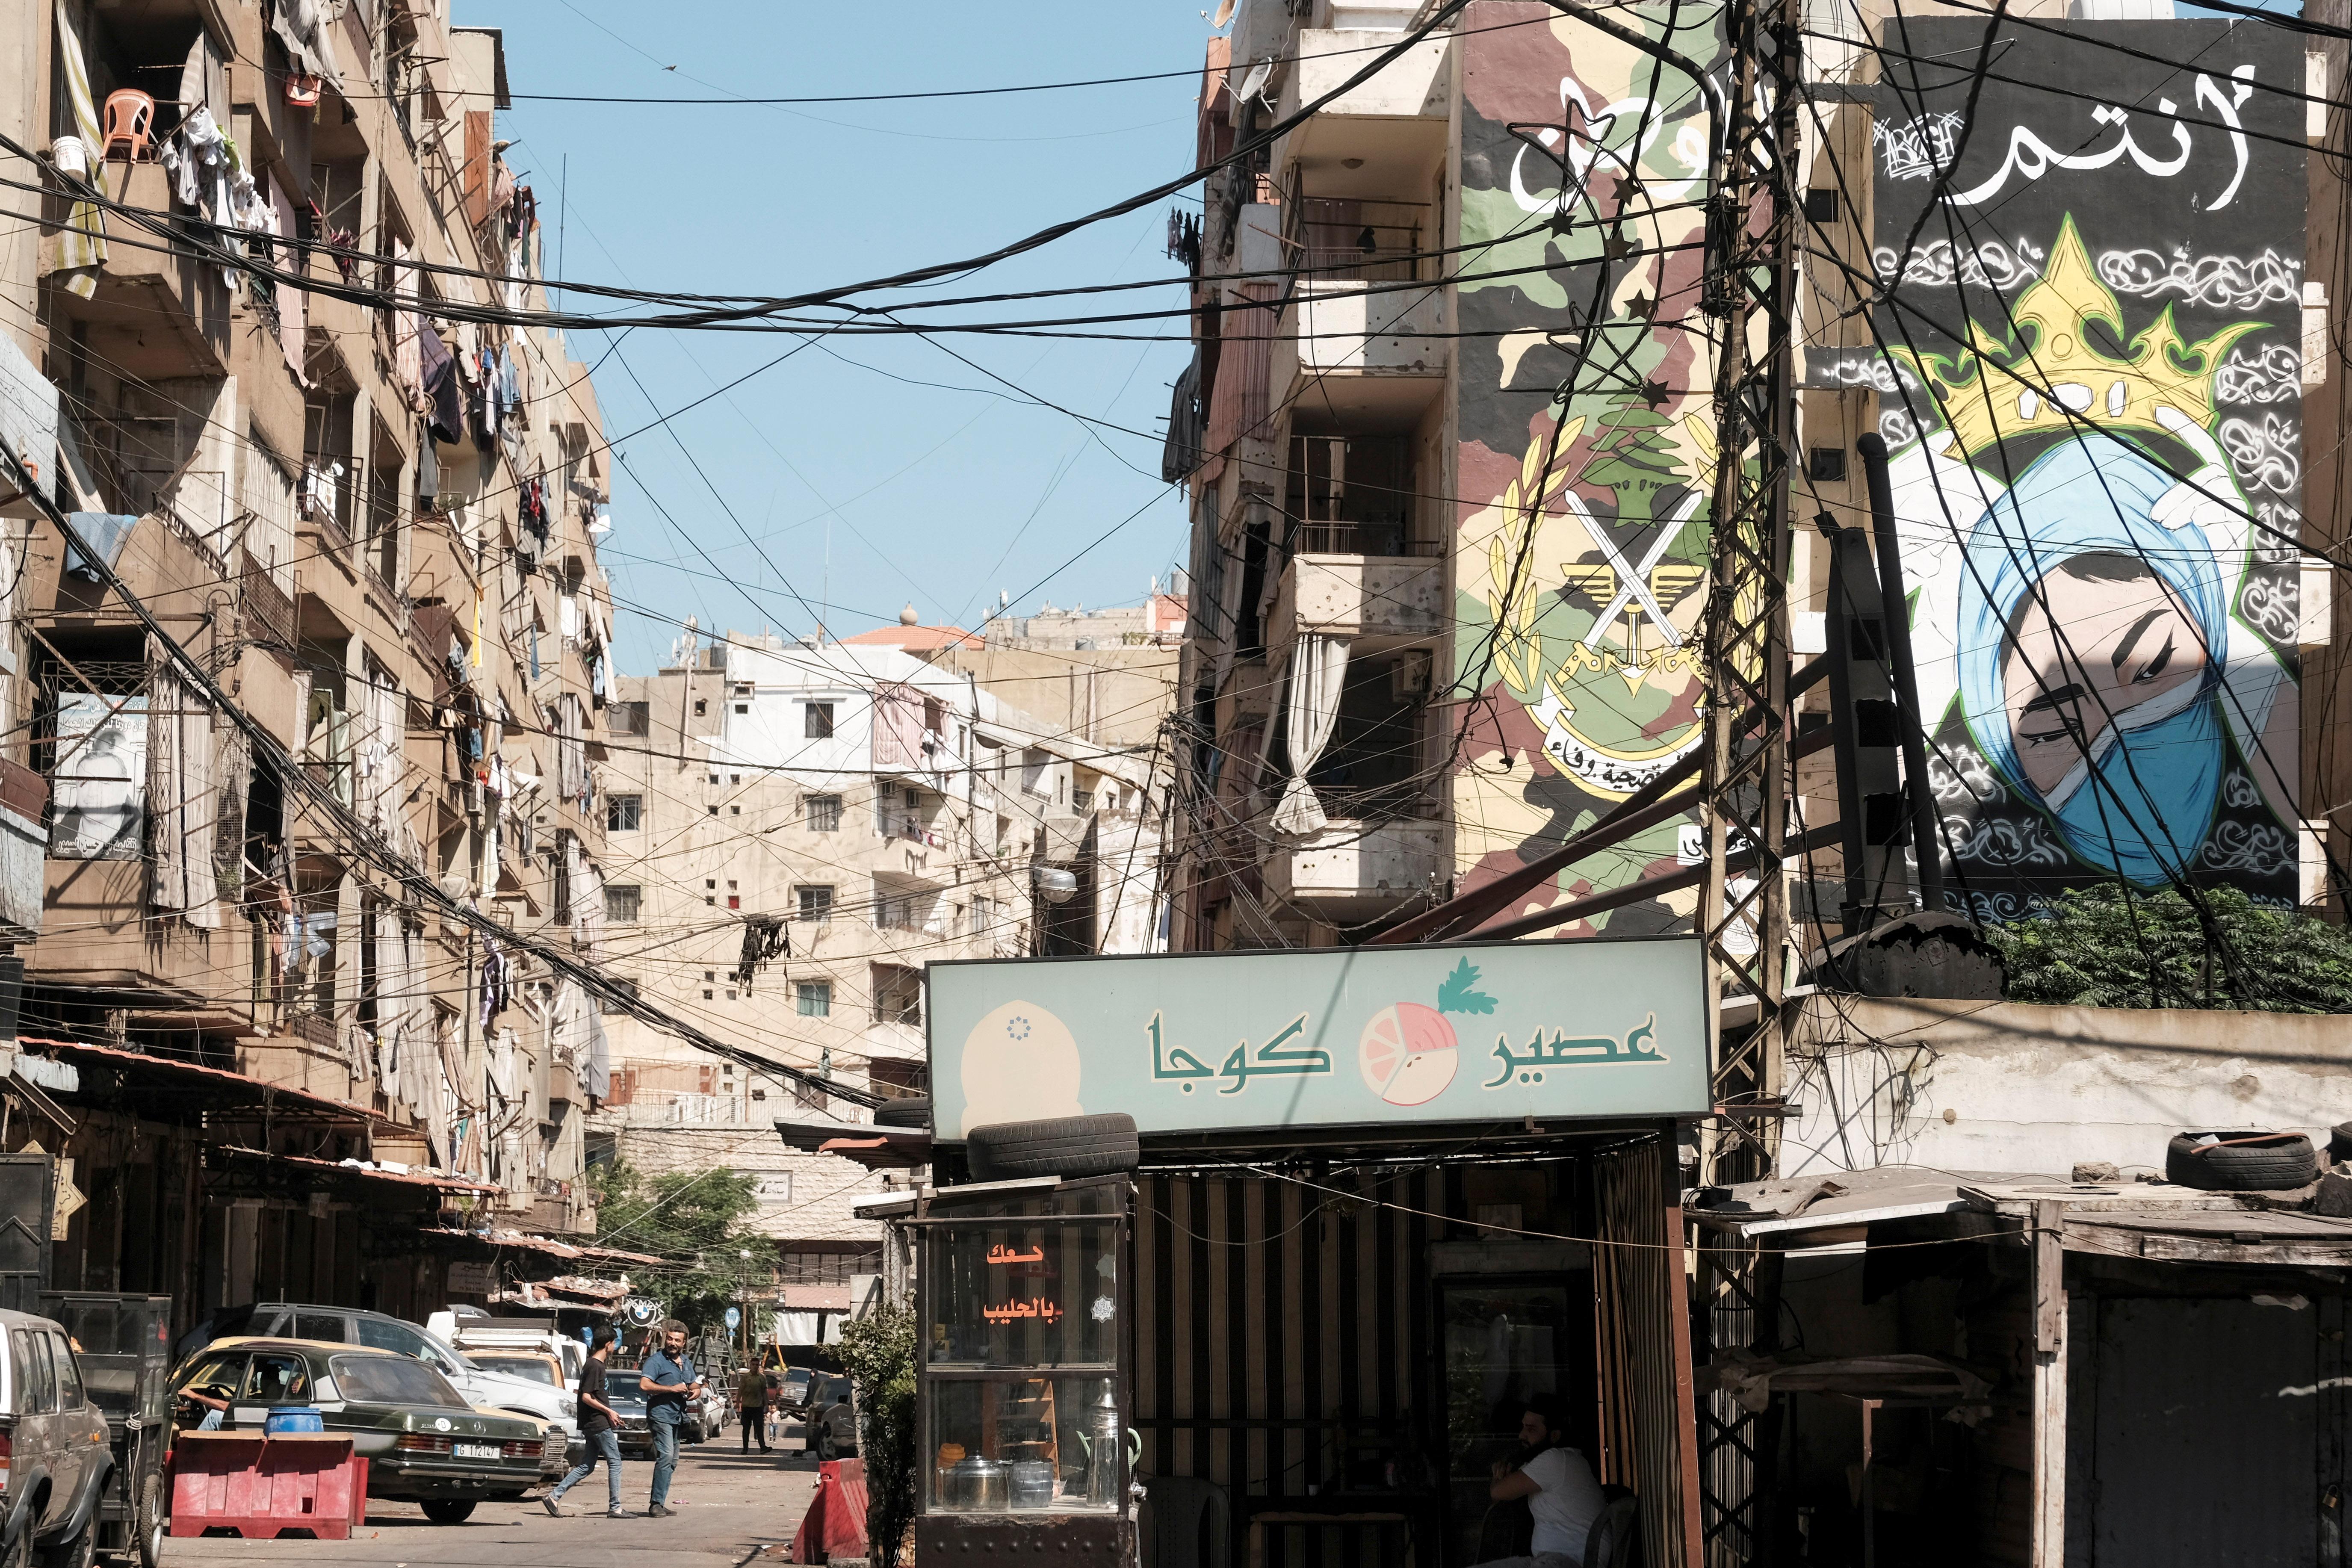 People walk along a street in Tripoli, Lebanon June 21, 2021.   REUTERS/Emilie Madi